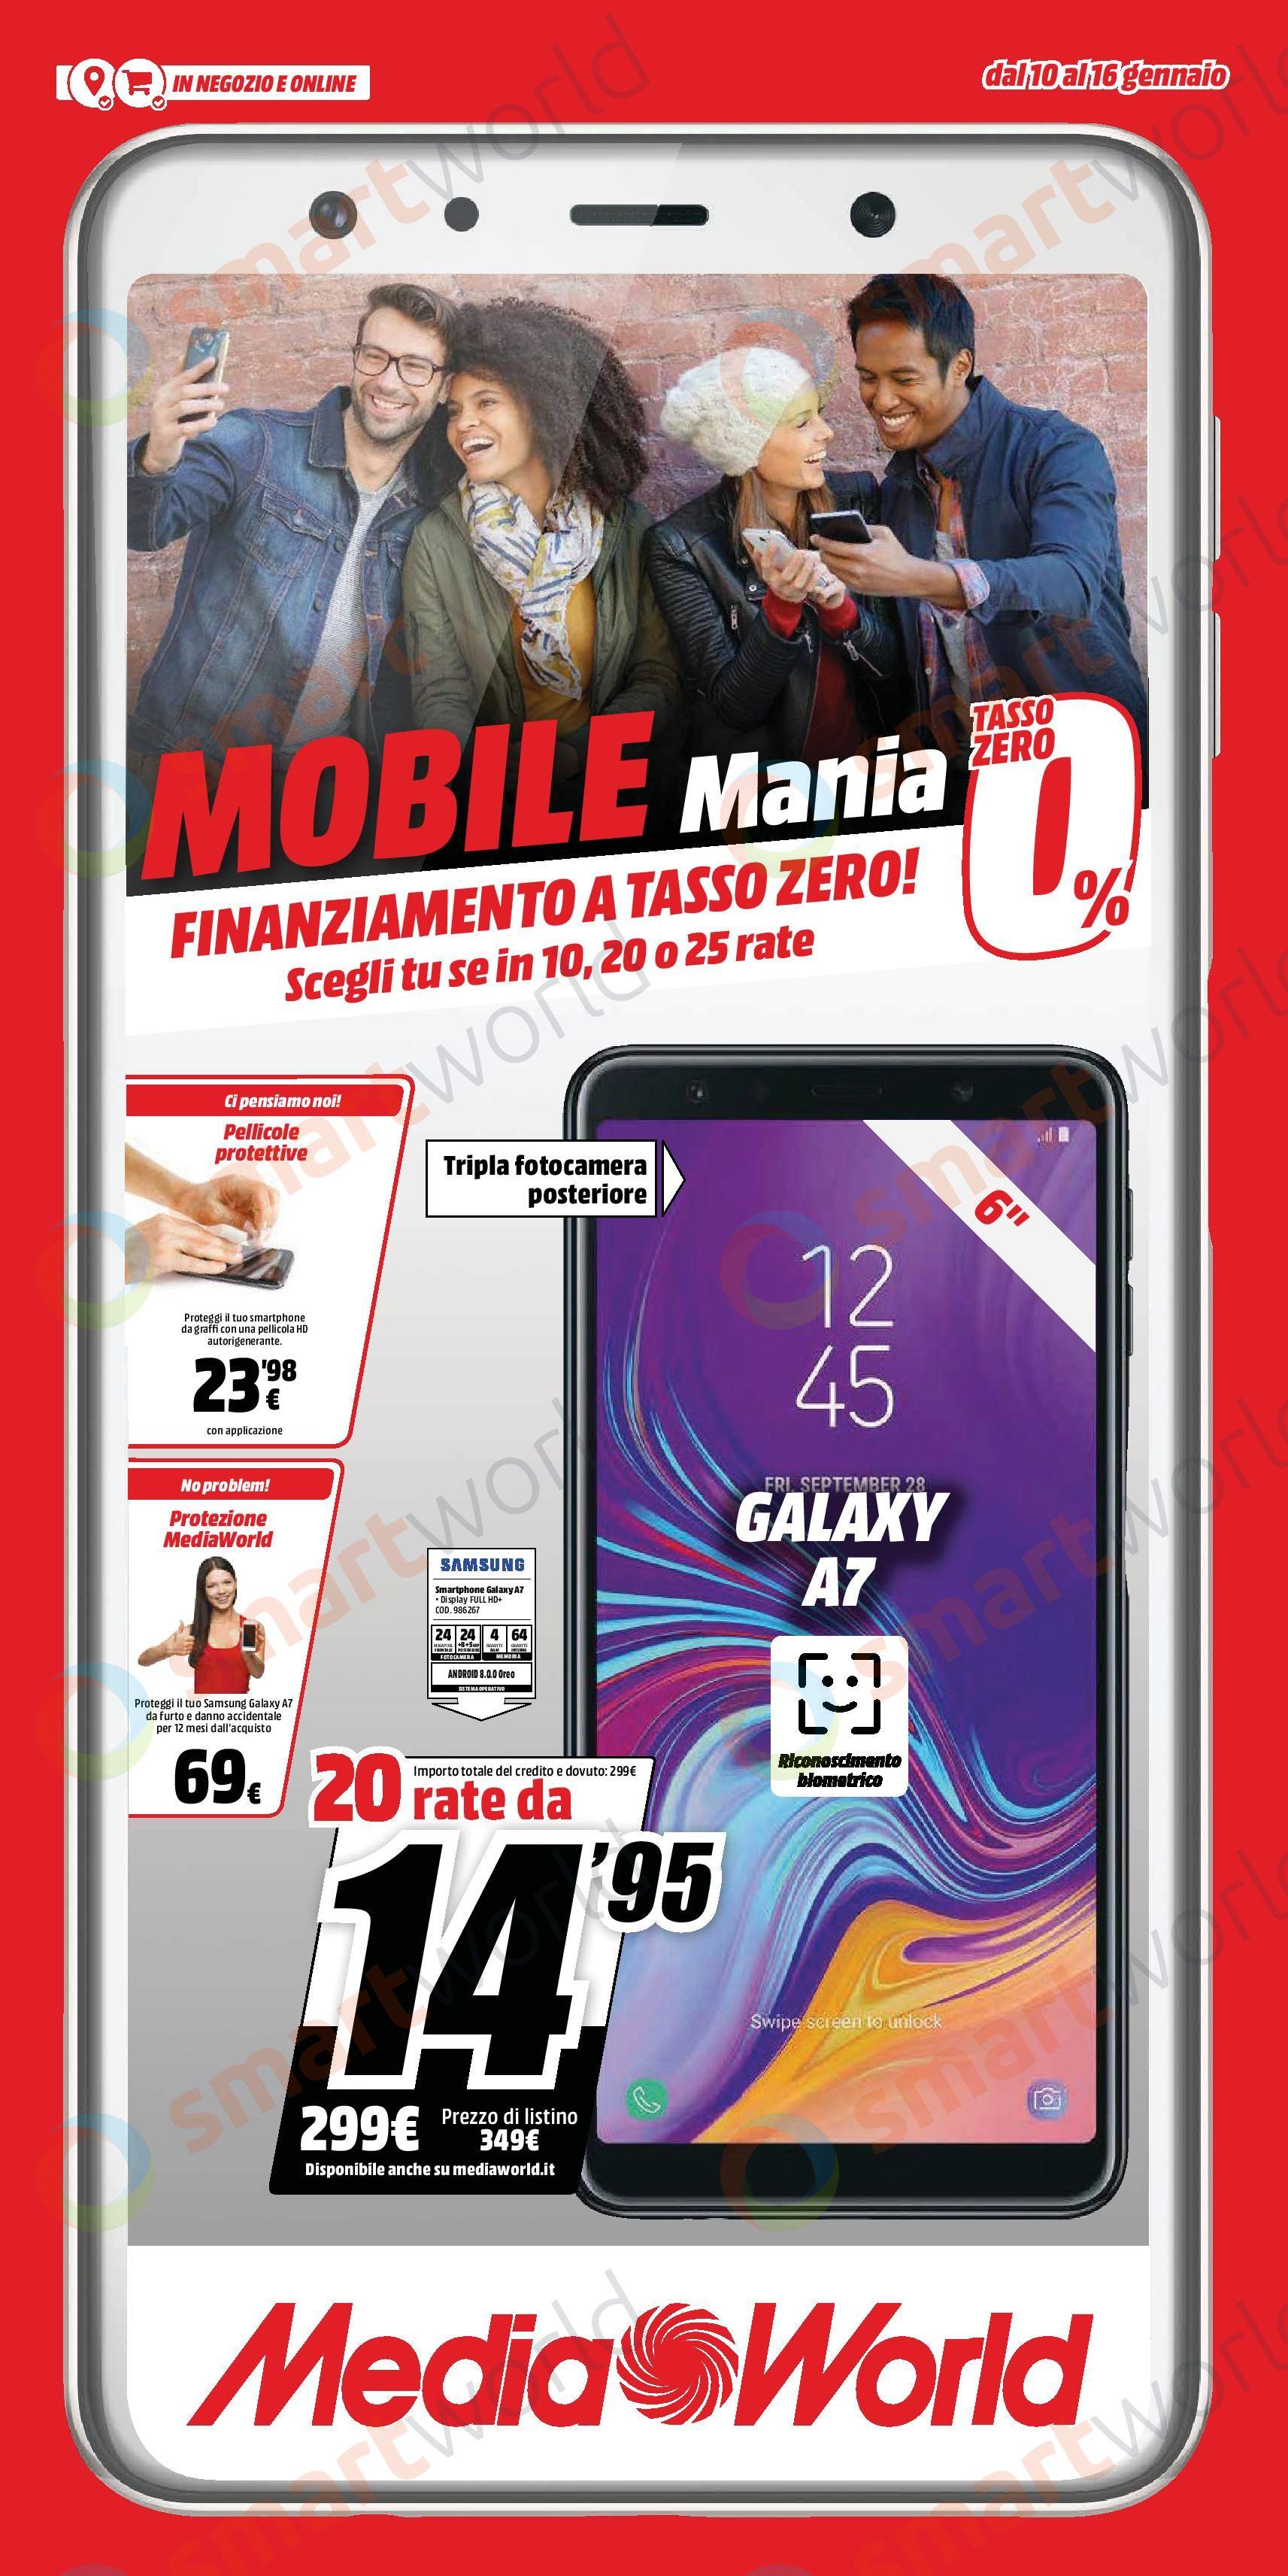 volantino mediaworld mobile mania gennaio 2019 (1)